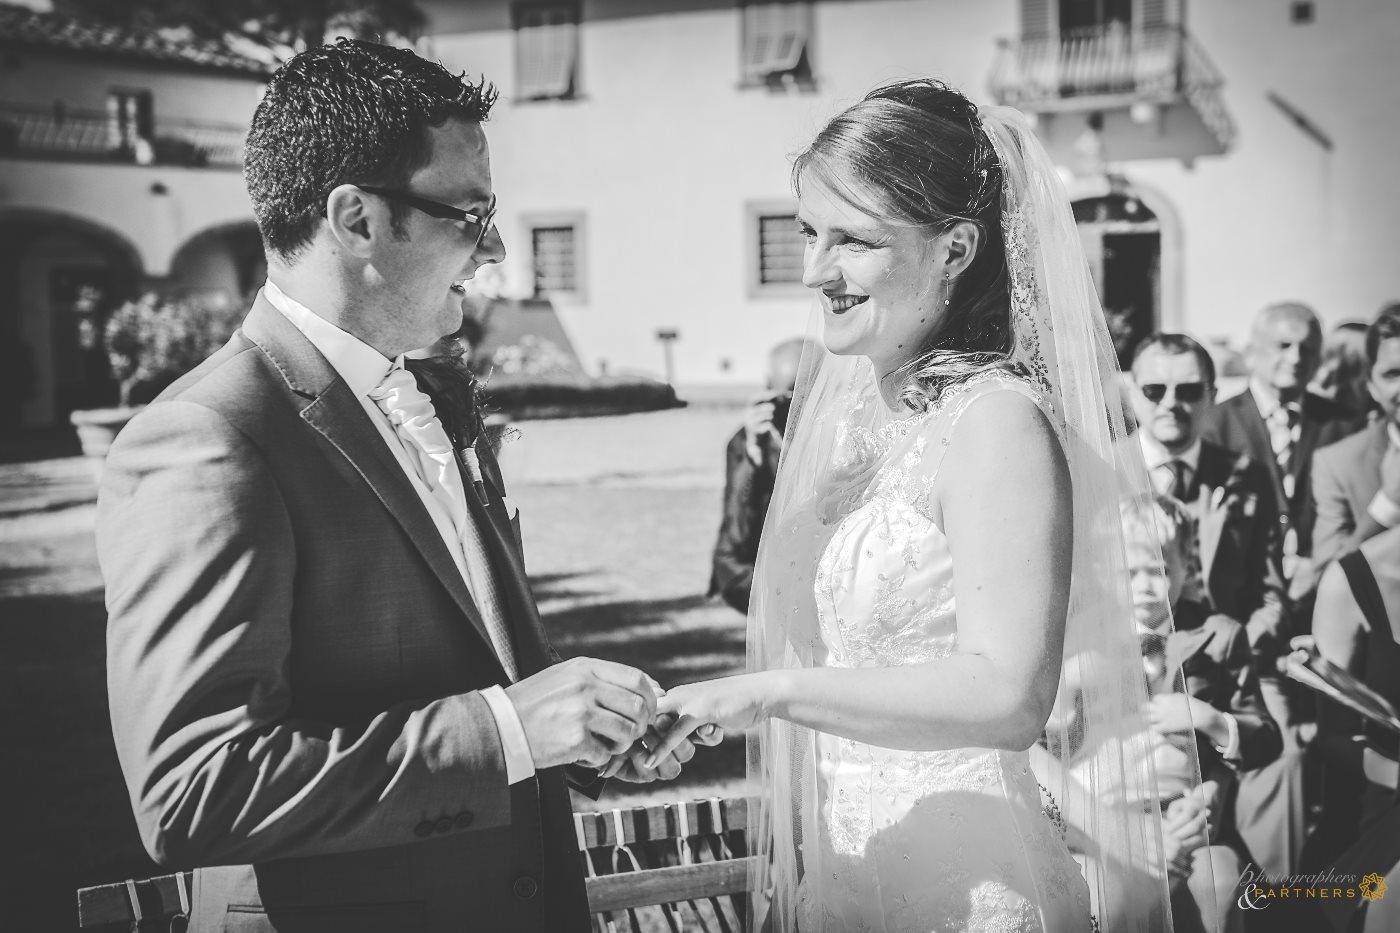 wedding_photos_sticciano_12.jpg